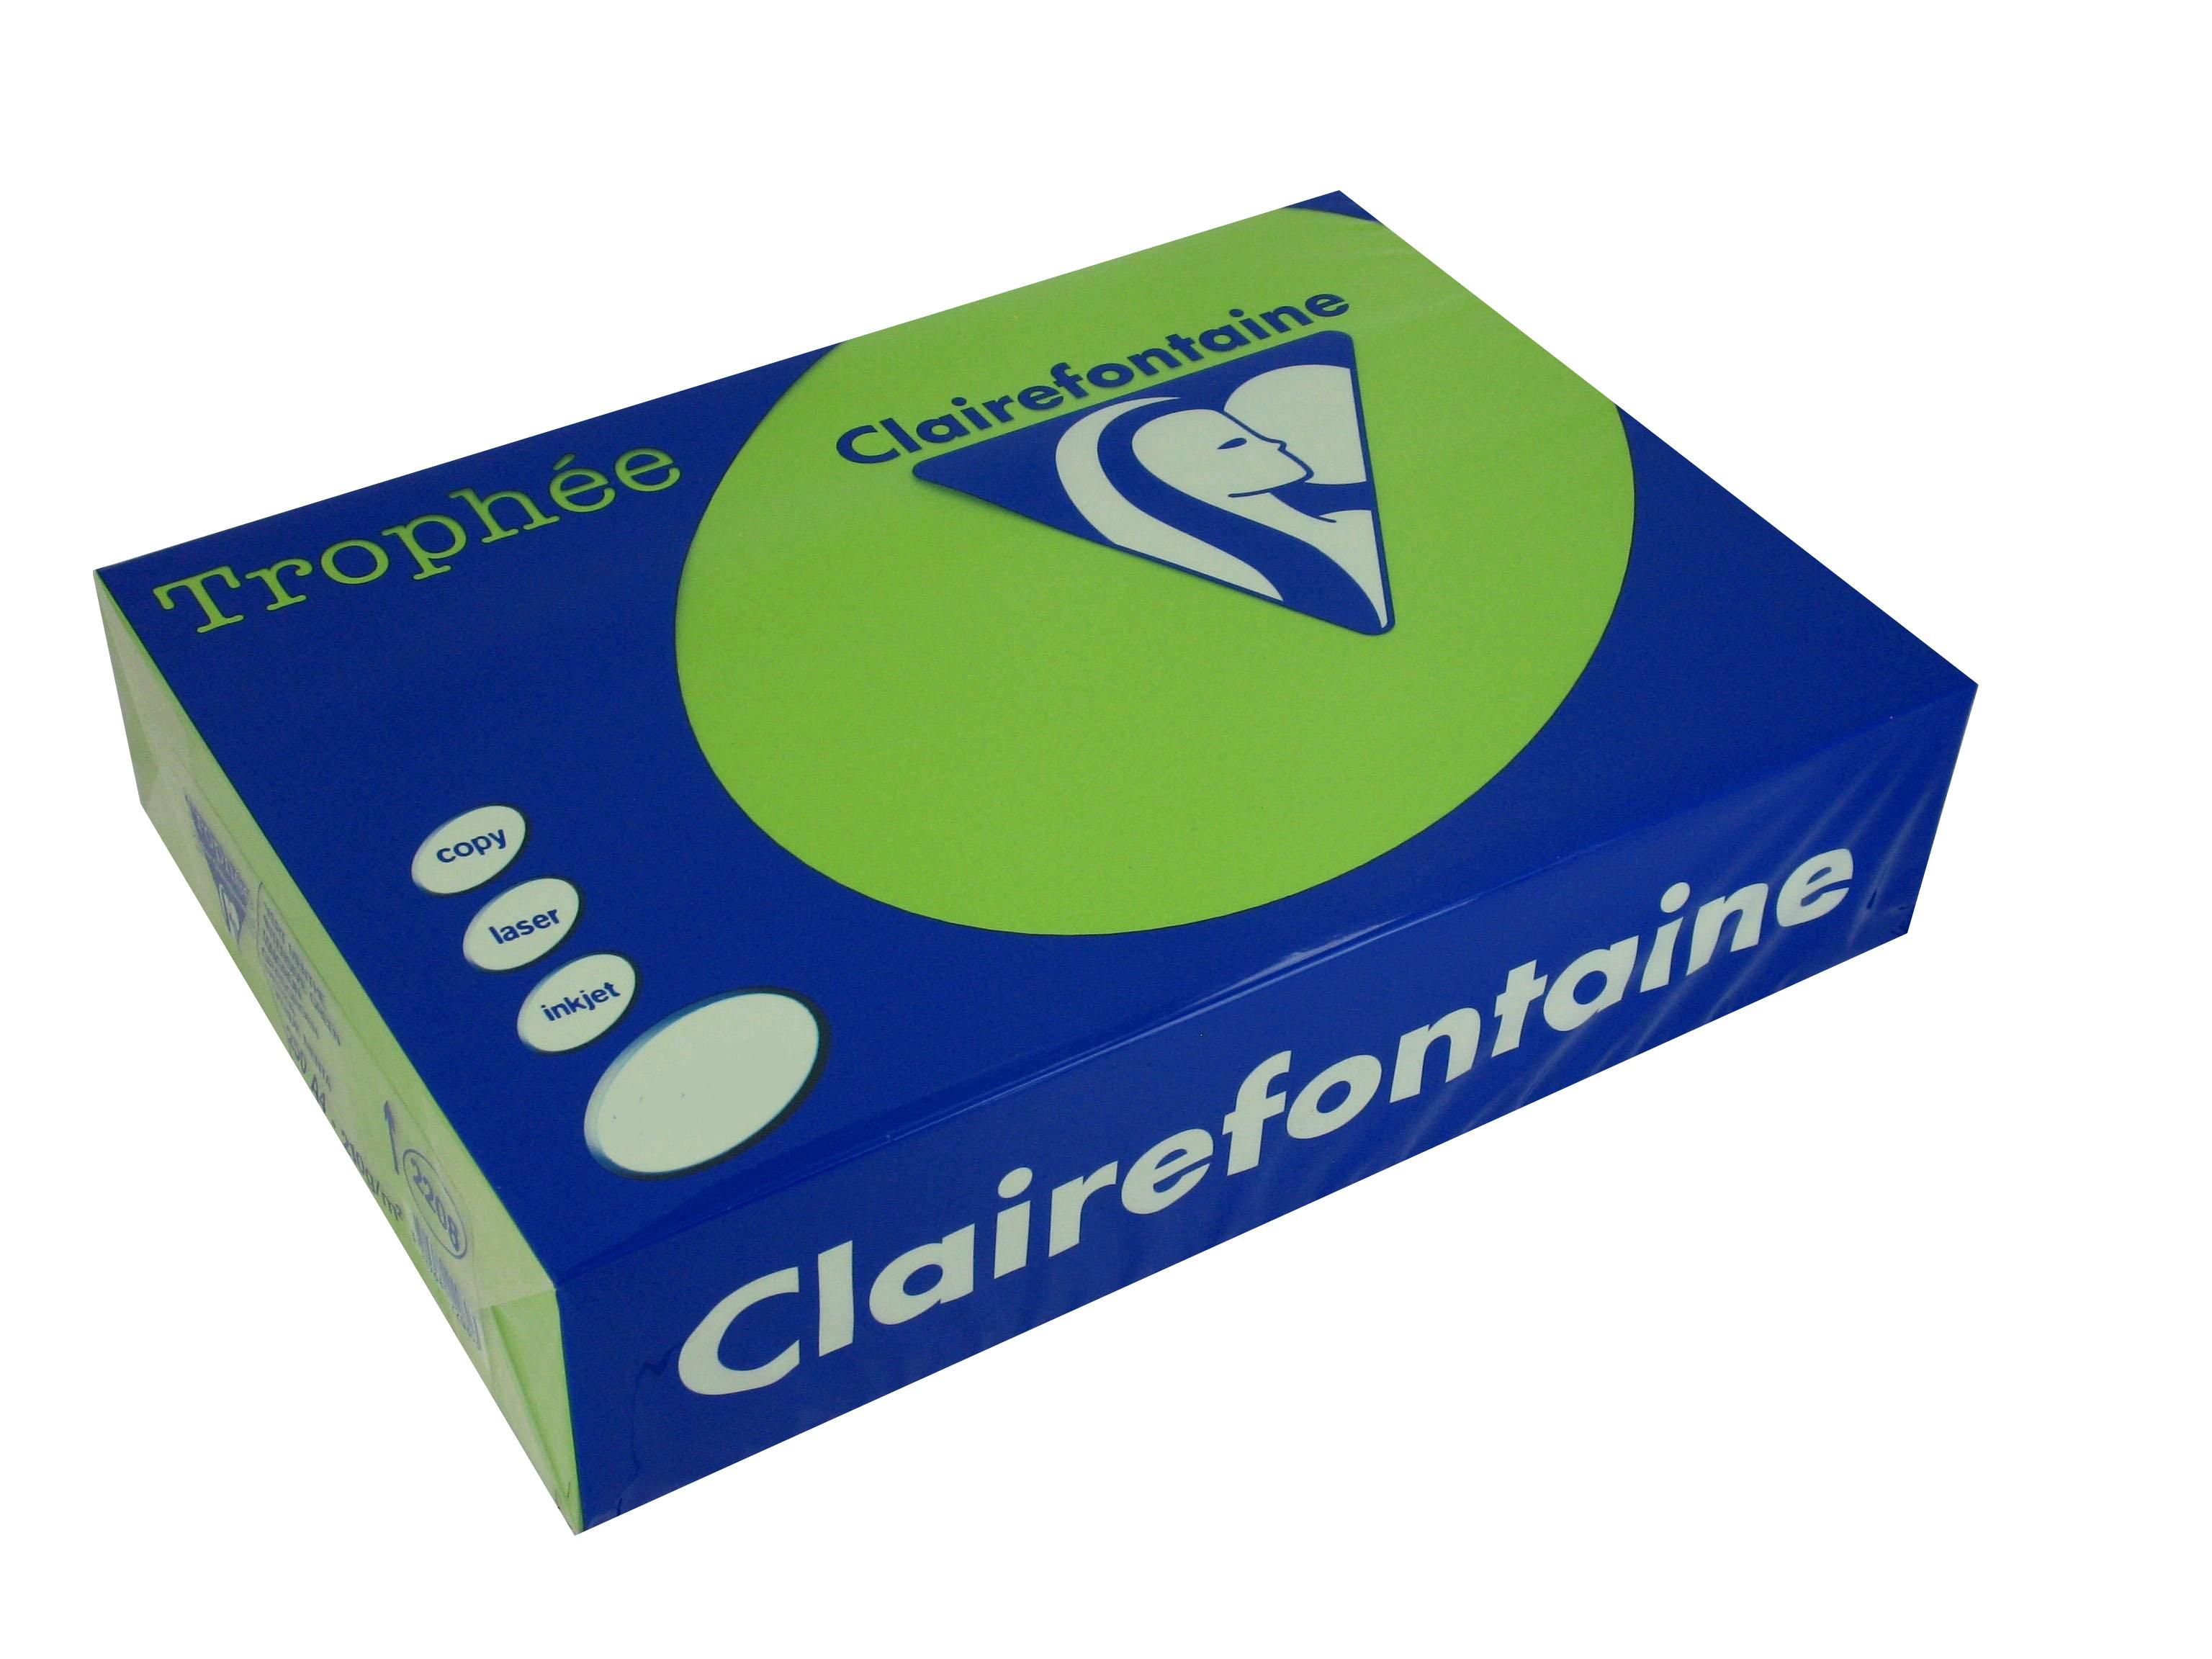 Clairefontaine Trophee Papier Maigrün 160g/m² DIN-A3 - 250 Blatt